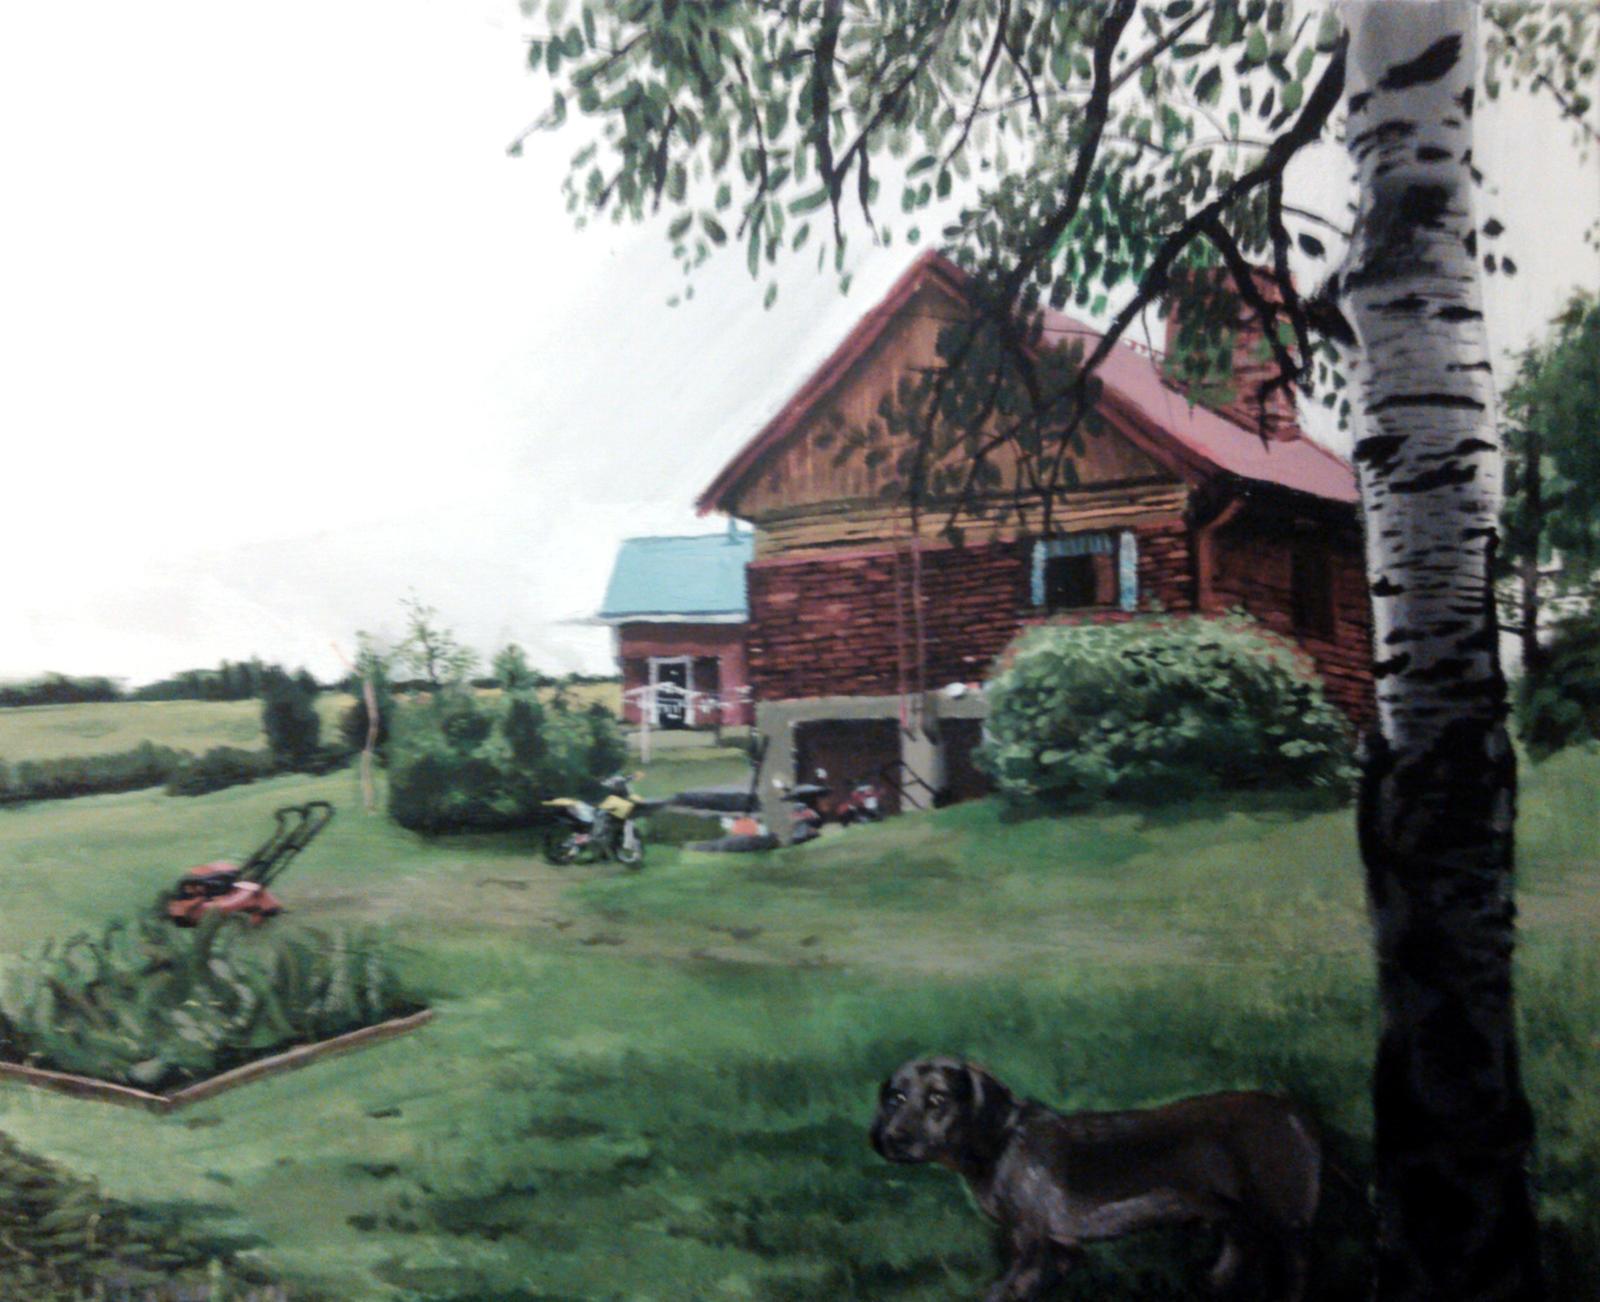 Home Landscape by NoRuLLa